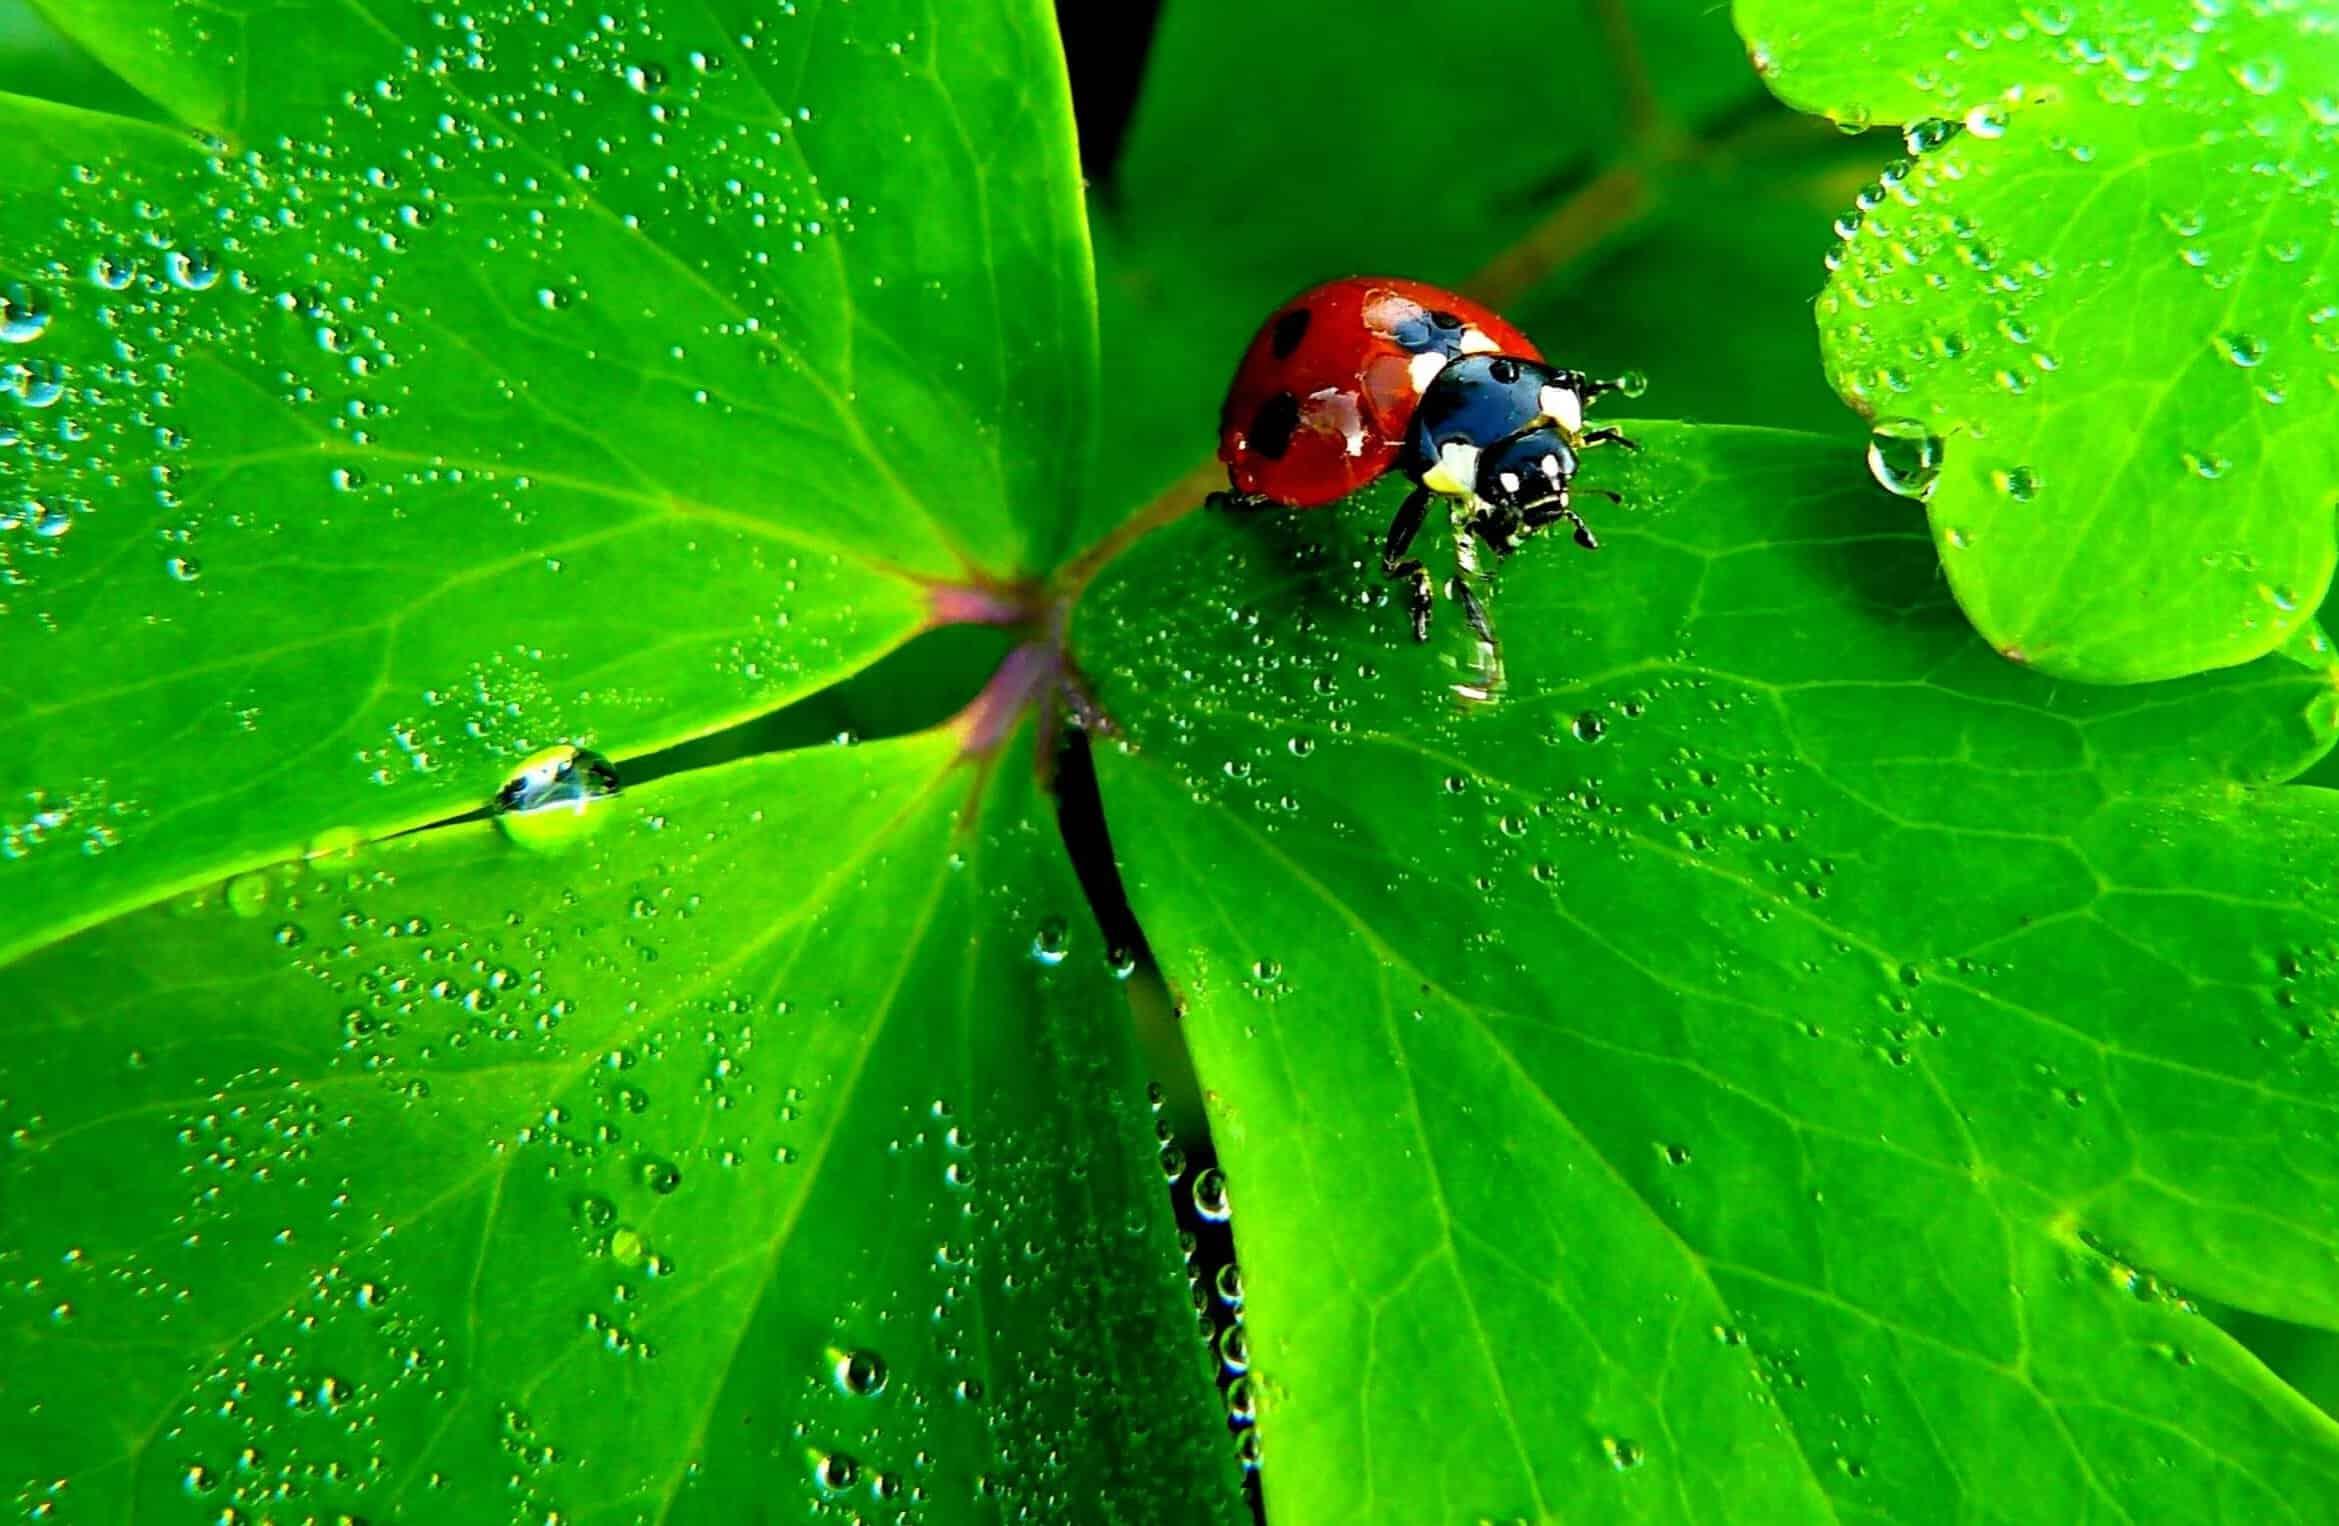 Free picture: nature, rain, garden, leaf, ladybug, flora ...